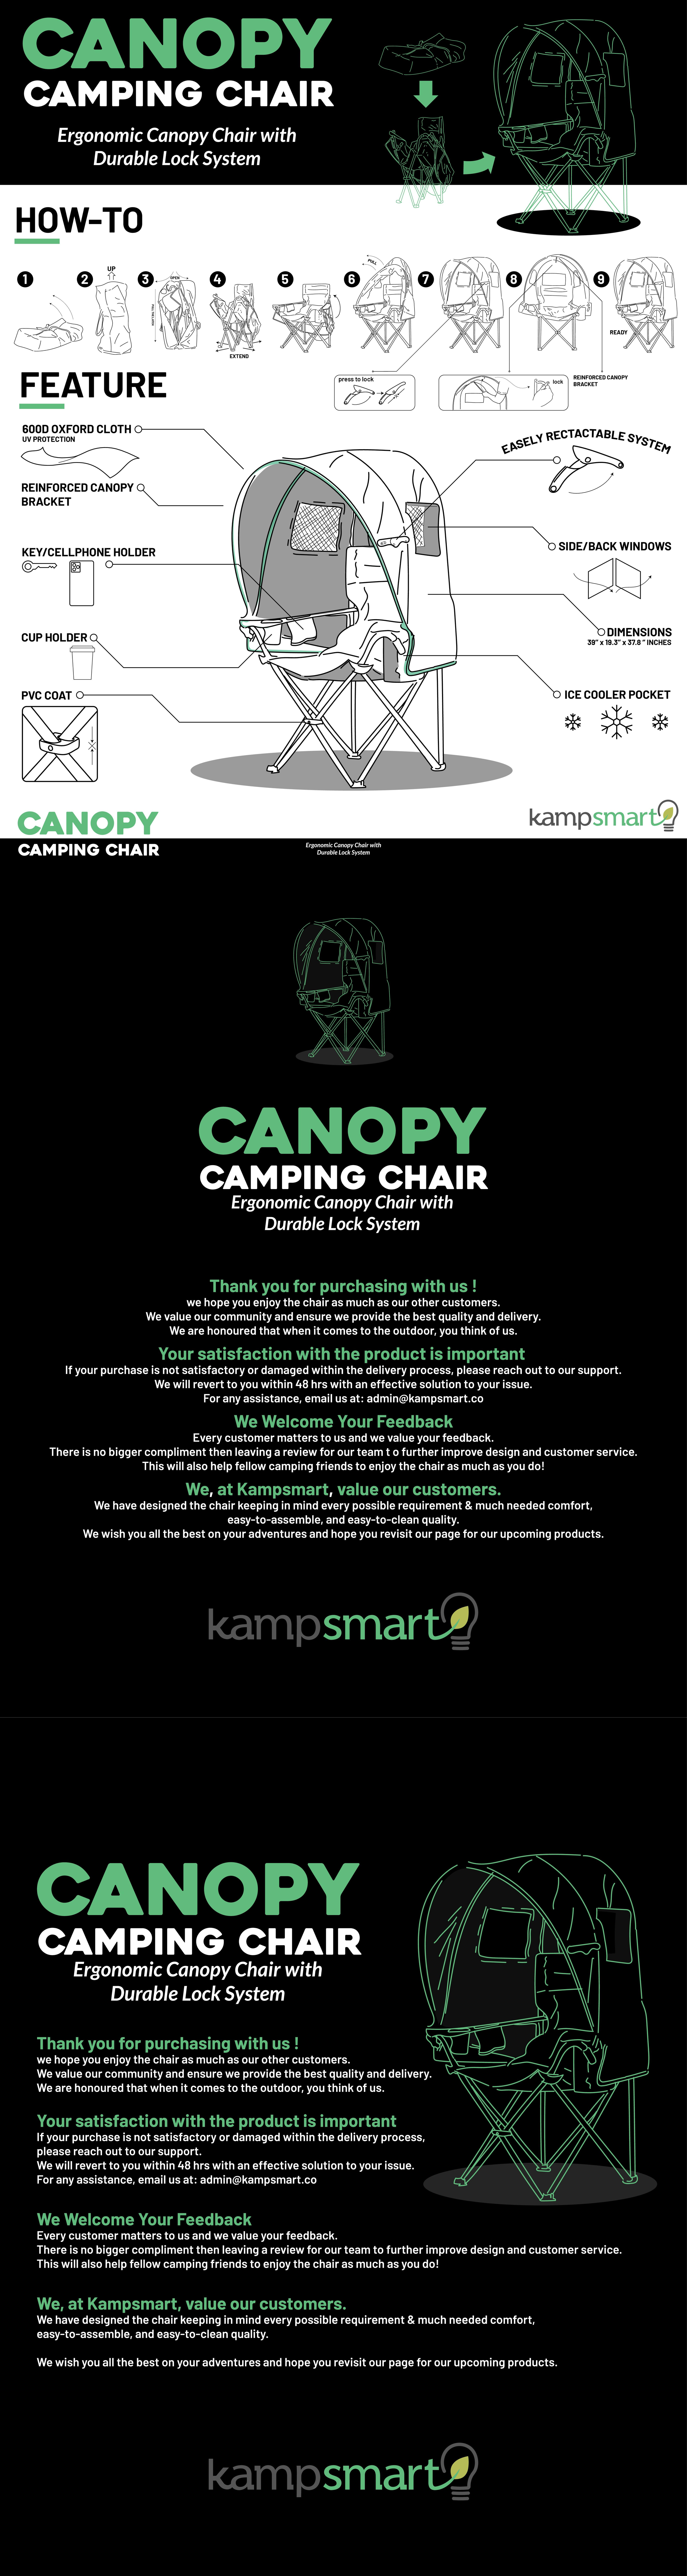 Kamp Smart - Canopy Camping Chair Manual